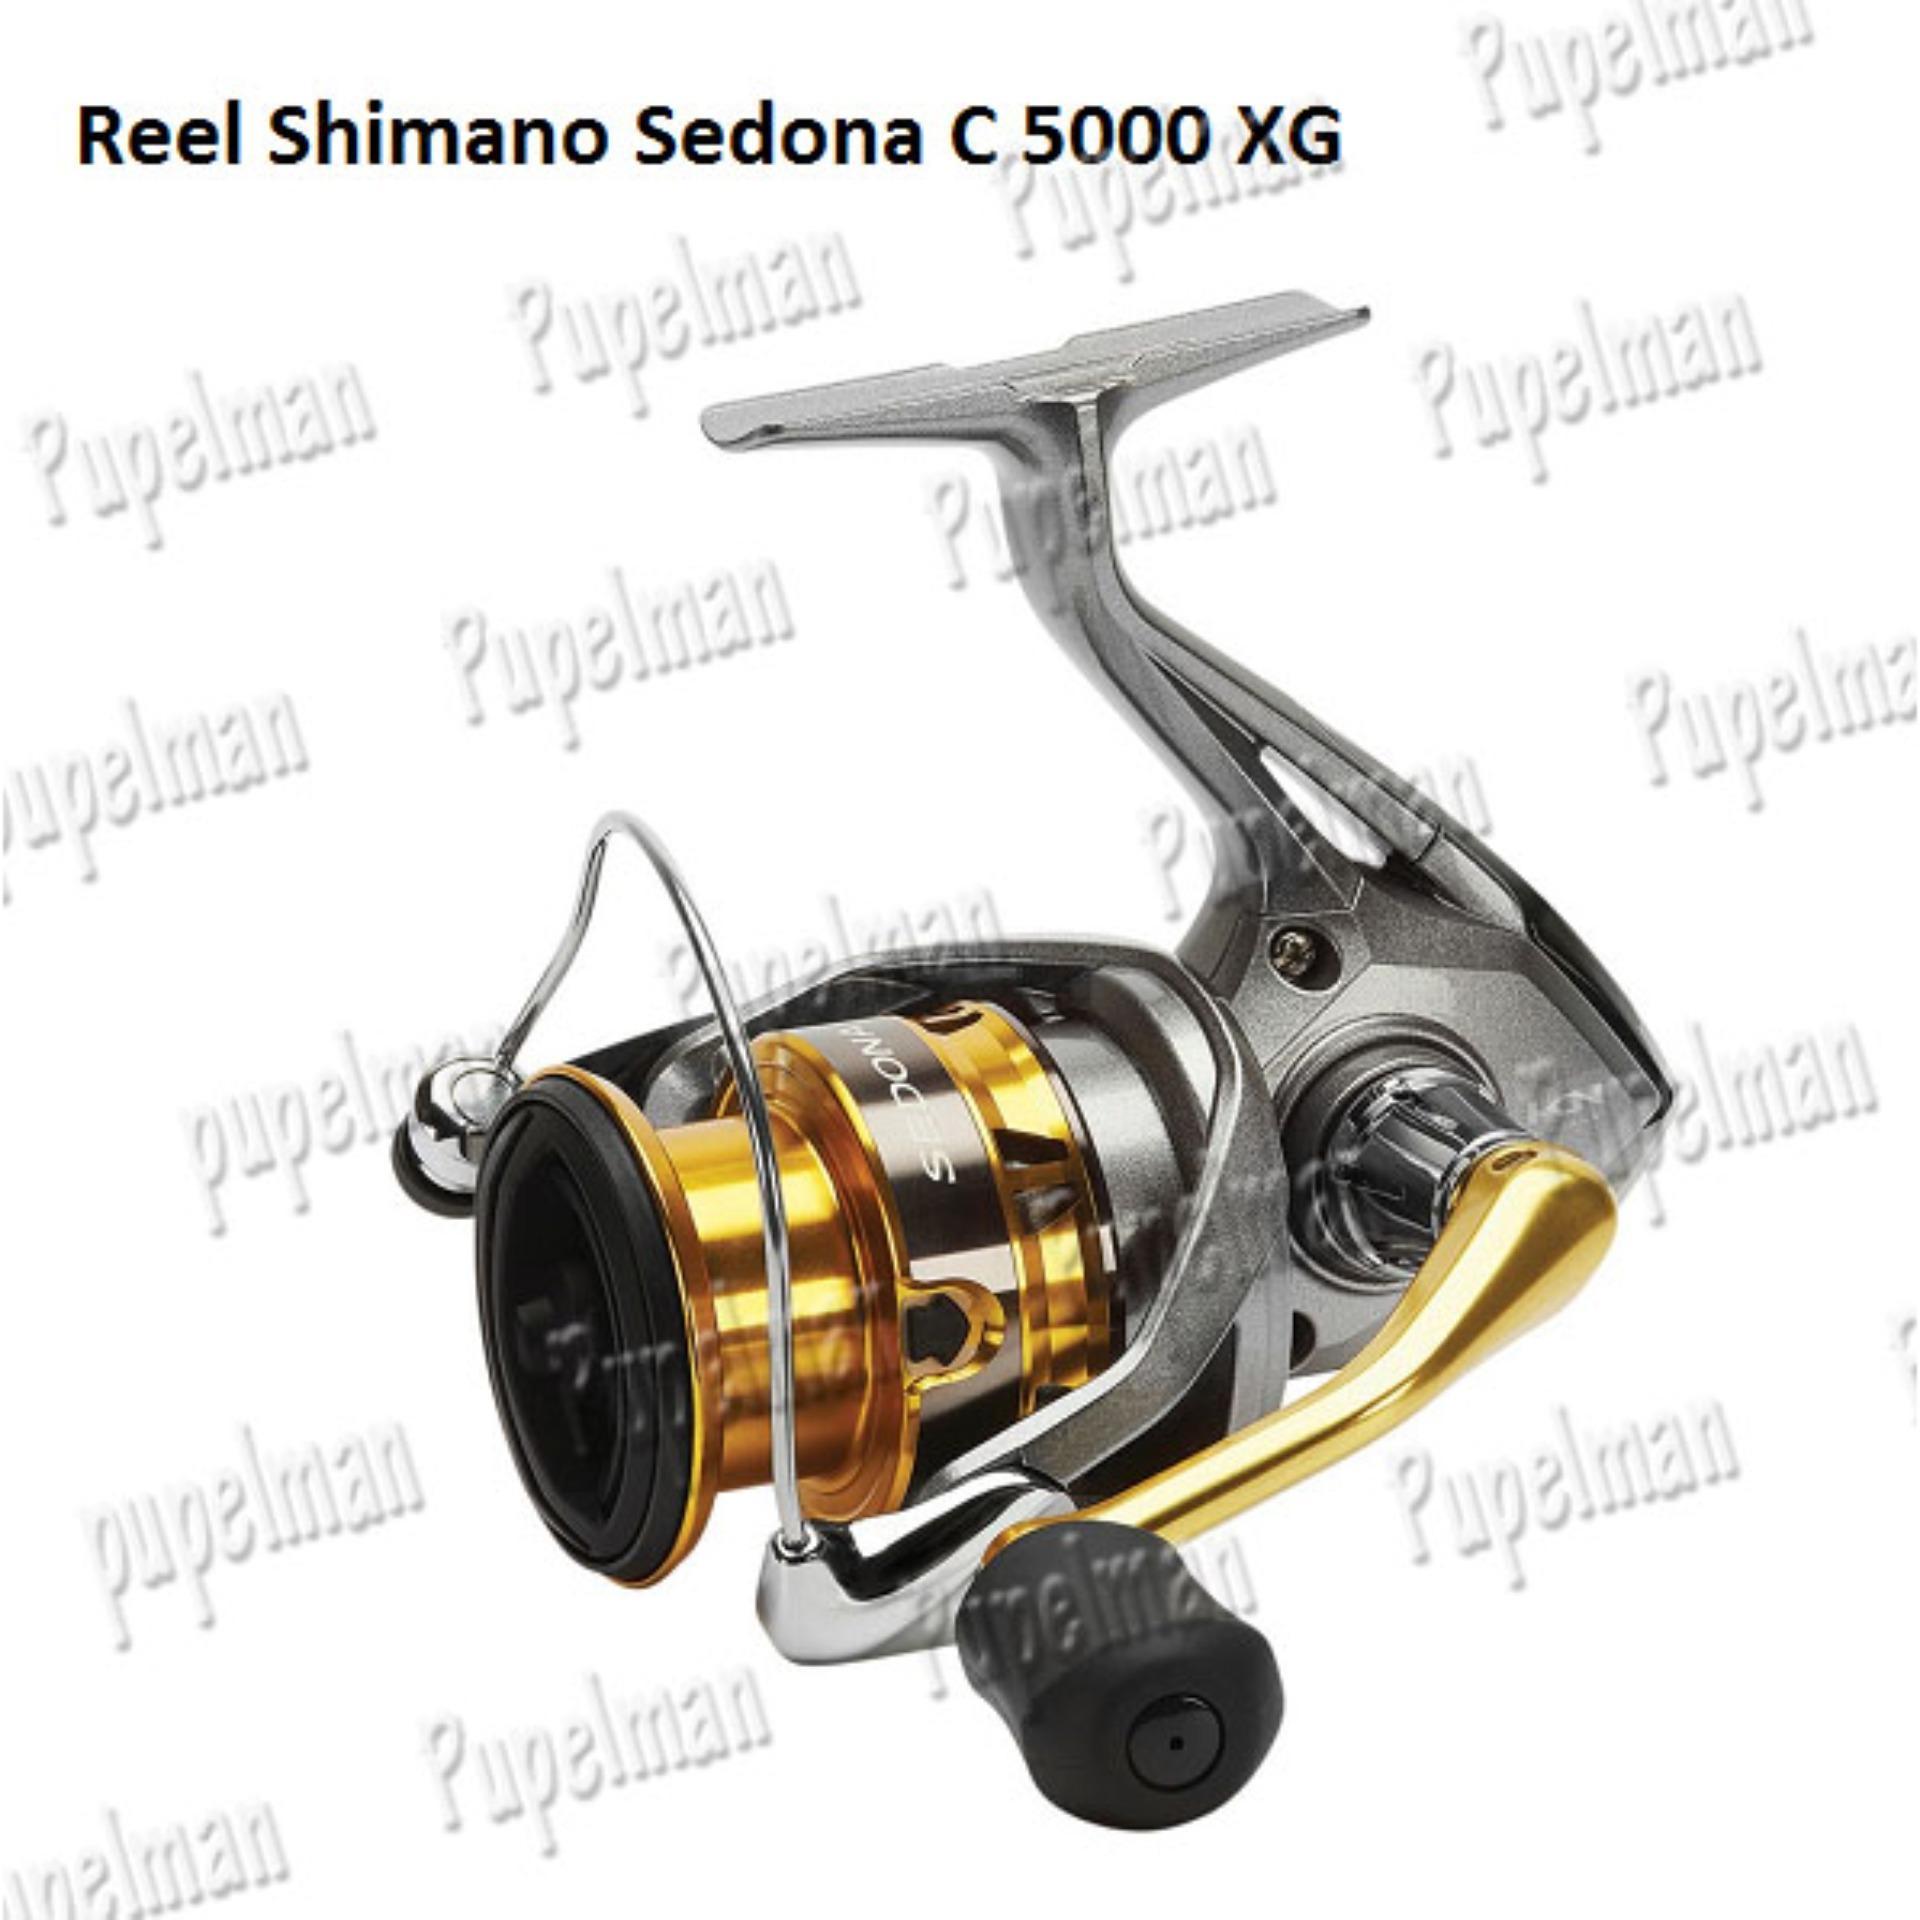 Reel Shimano Sedona 5000XG C C5000XG 5000 XG Pancing Gulungan Spinning Rel